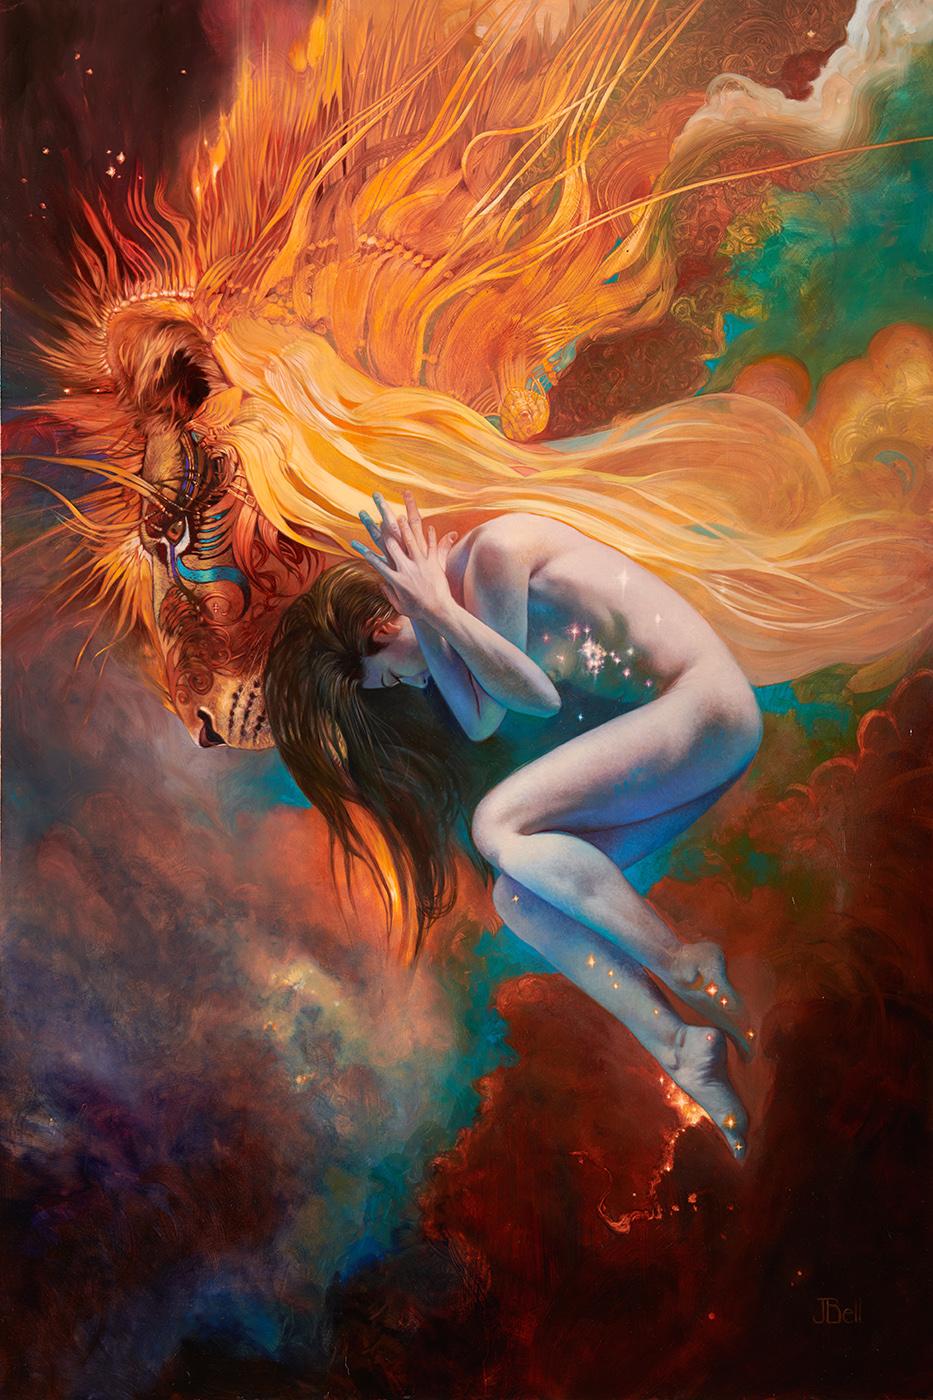 julie_bell_jb1037_lion_nebula.jpg